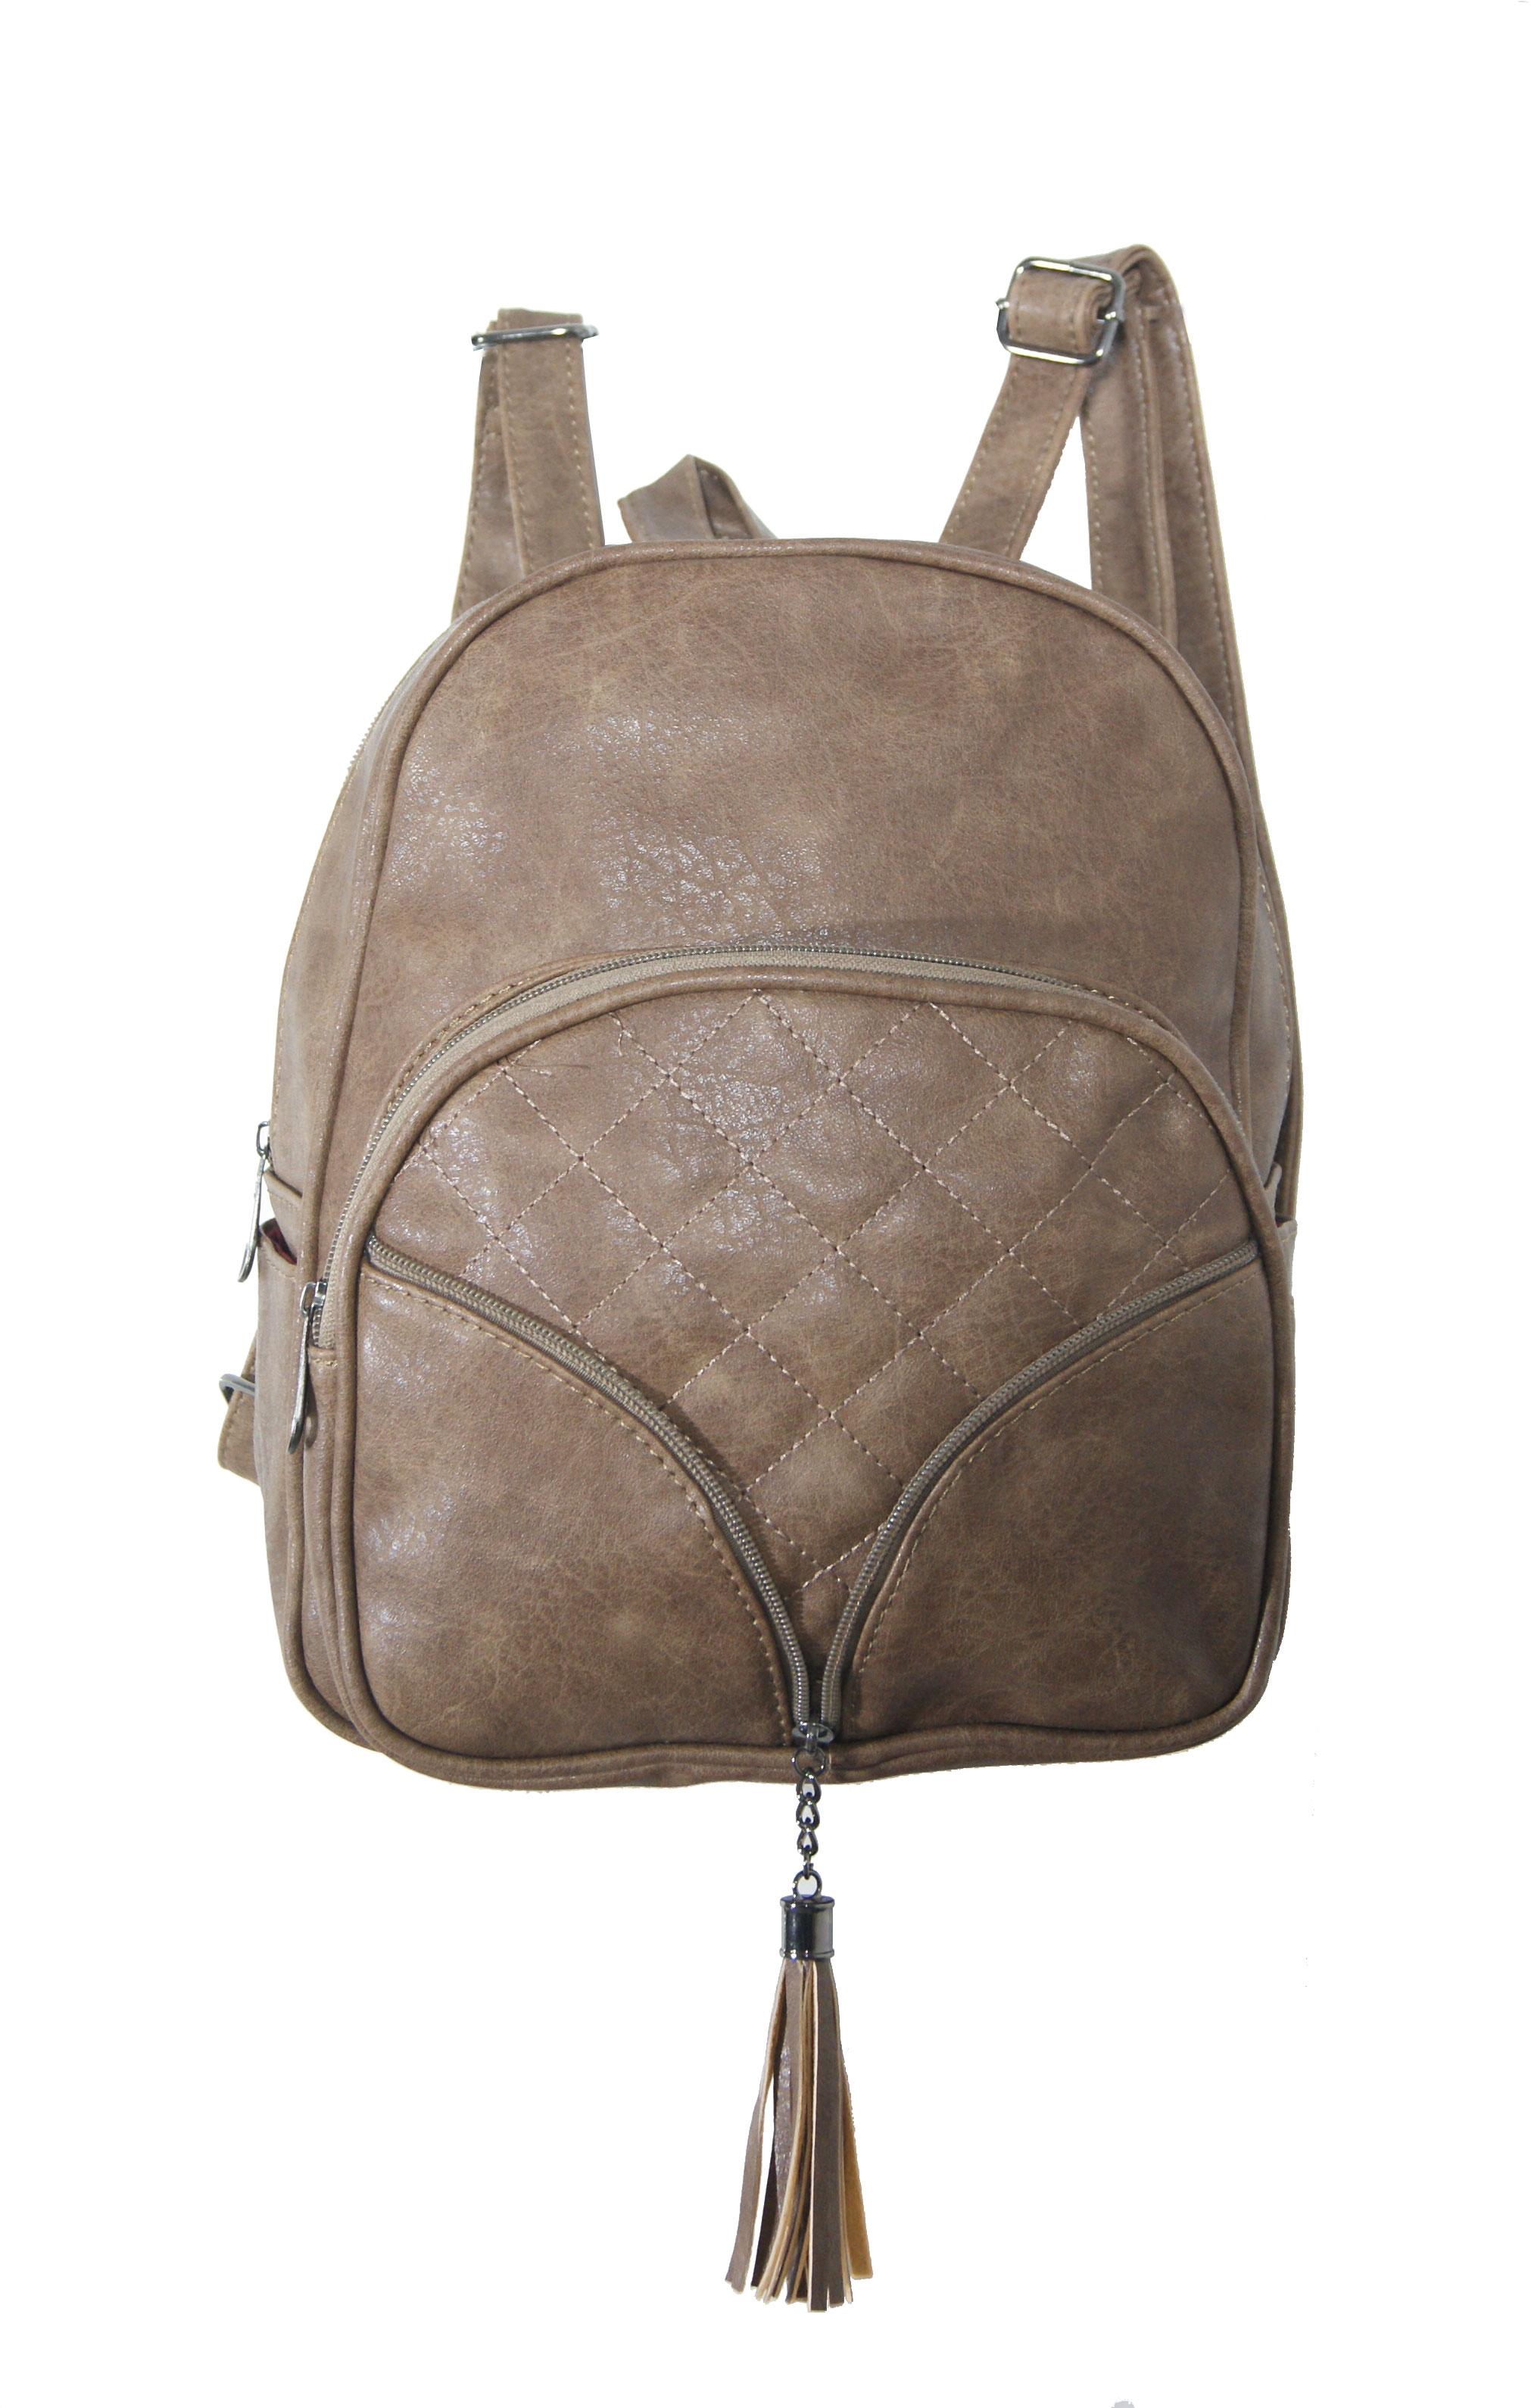 Backpack No 47 - Σοκολά (Silvio κωδ. 412)